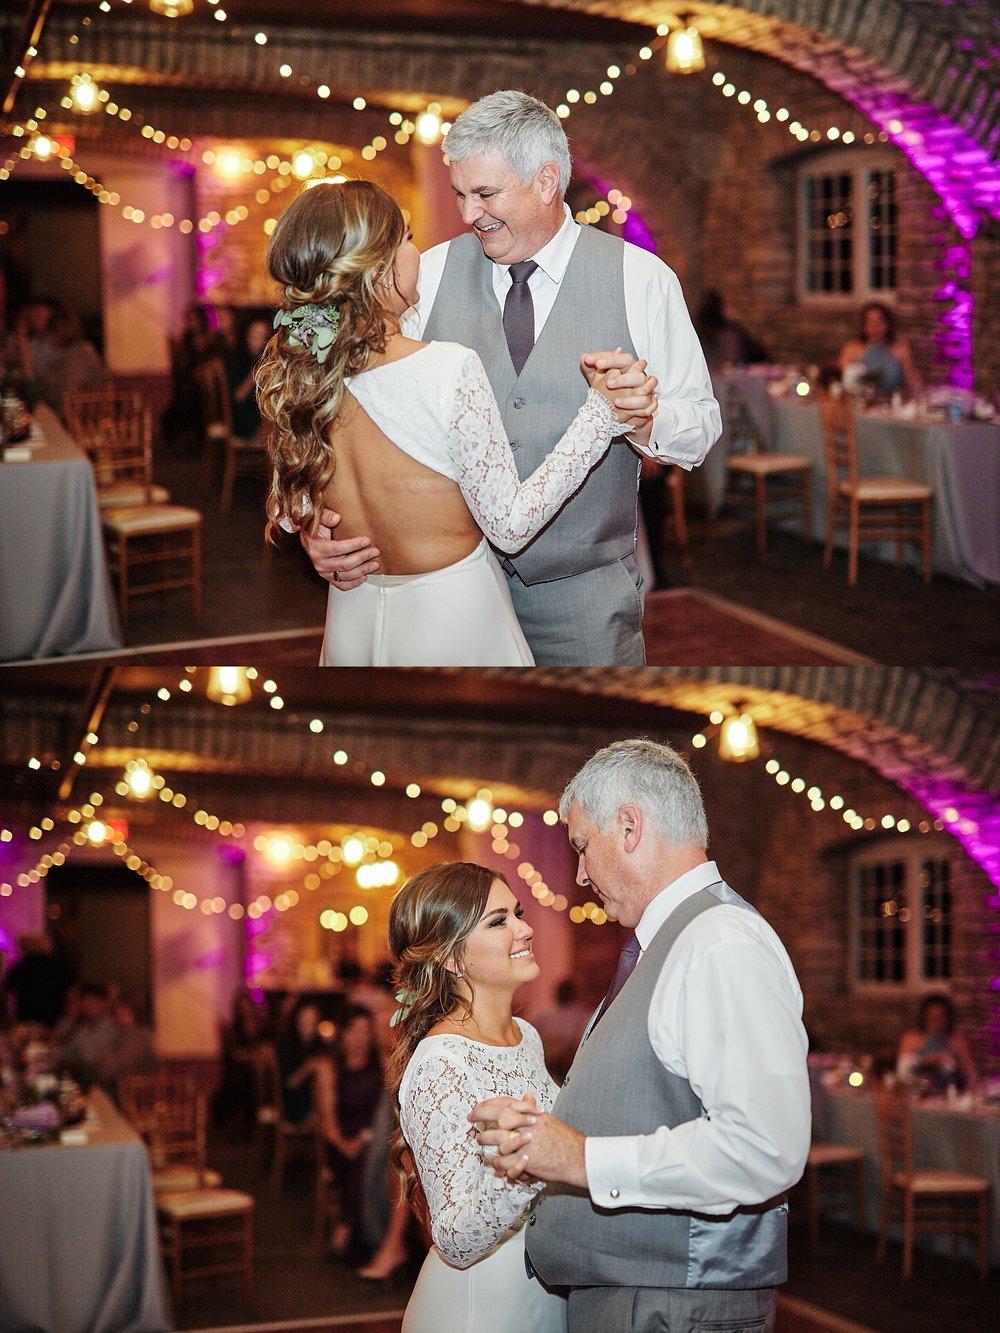 Maywood-Stone-Barn-Wedding-Rochester-Minnesota-Perry-James-Photo_0695.jpg